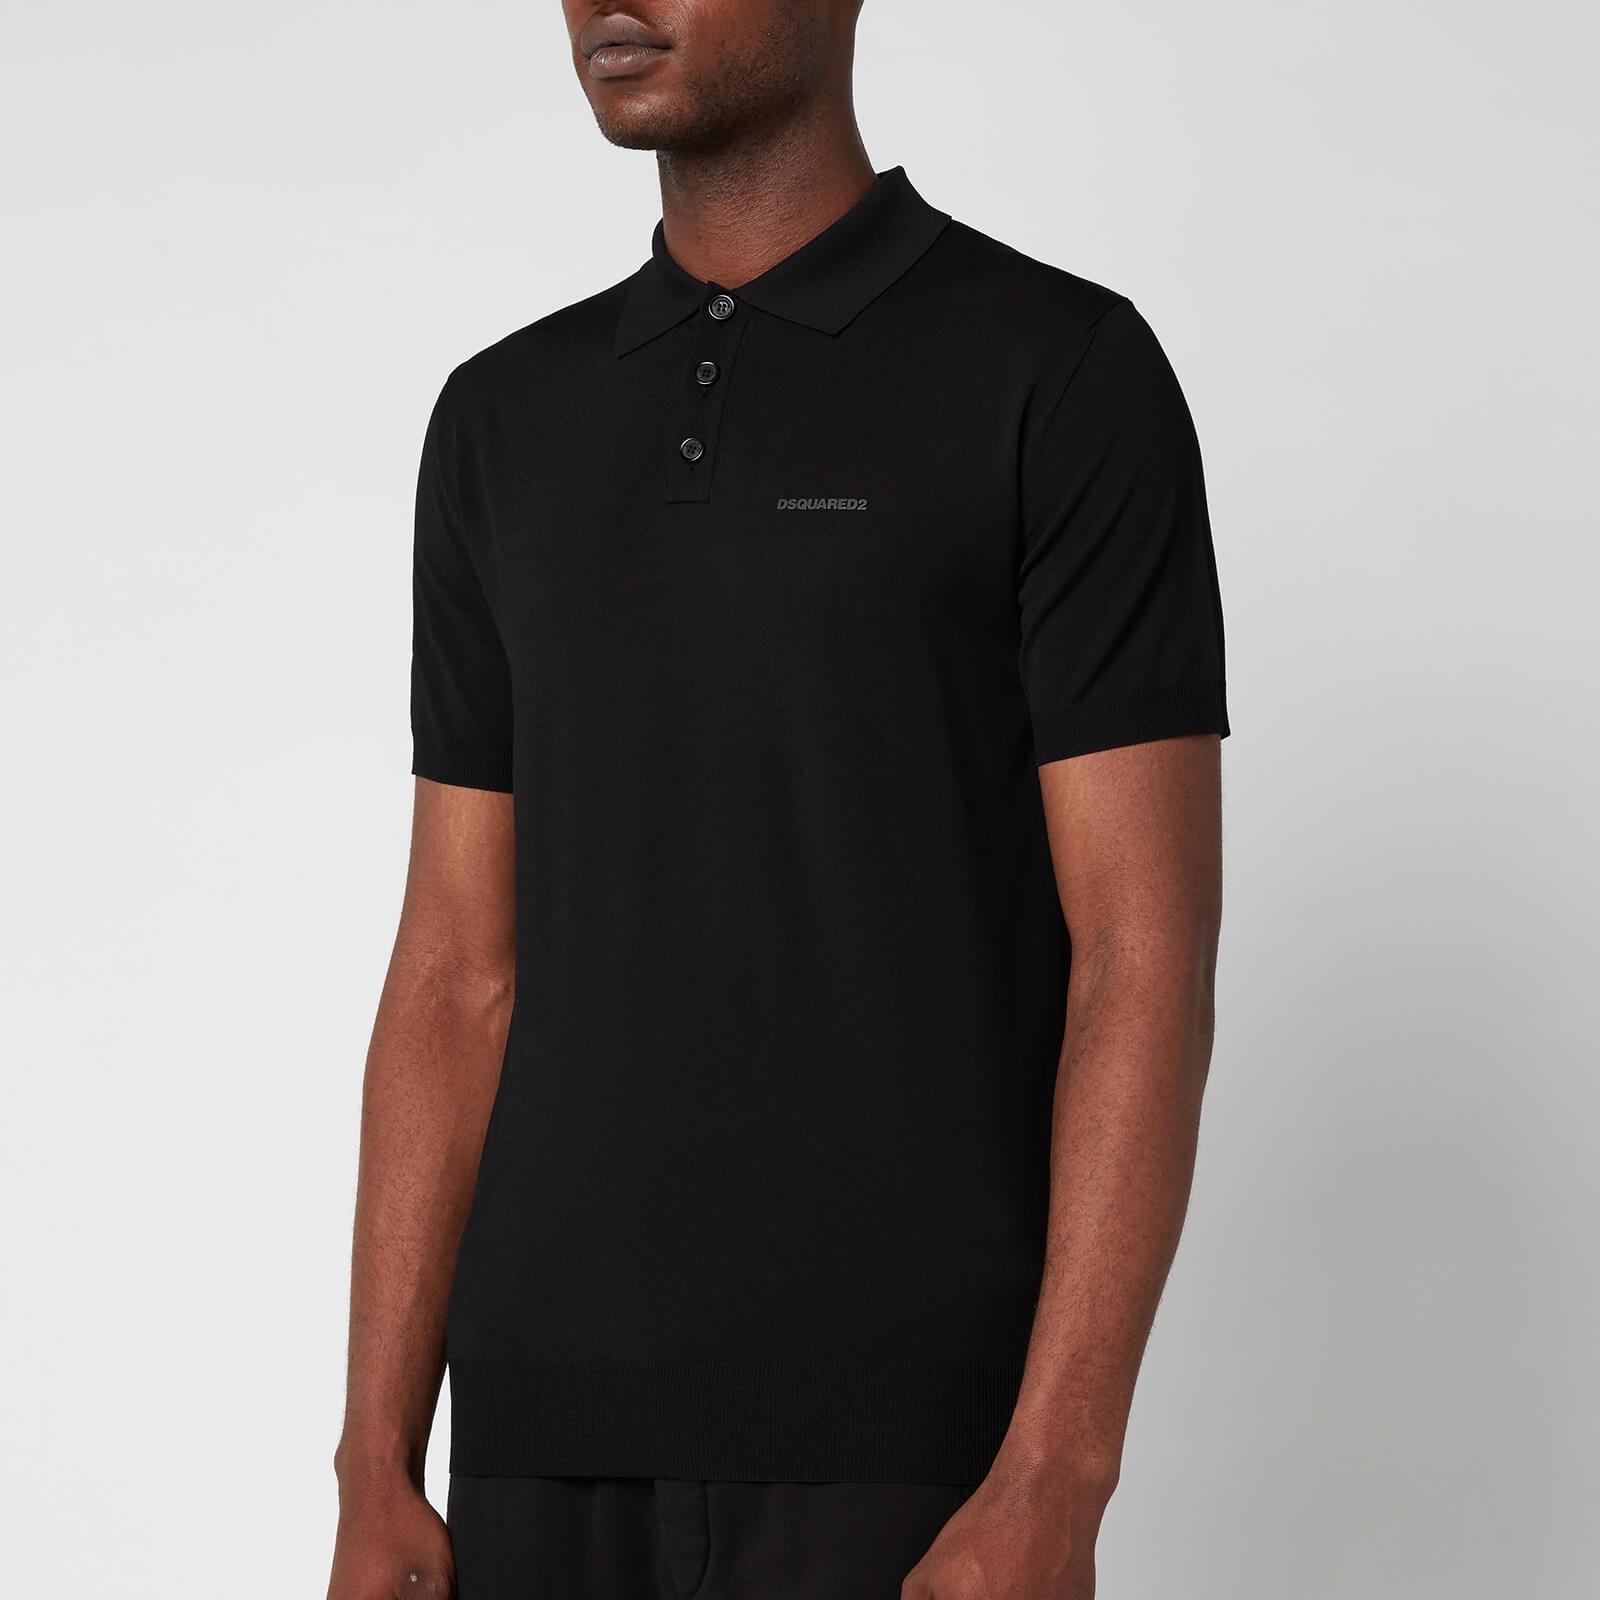 Dsquared2 Men's Big Logo Polo Shirt - Black - M